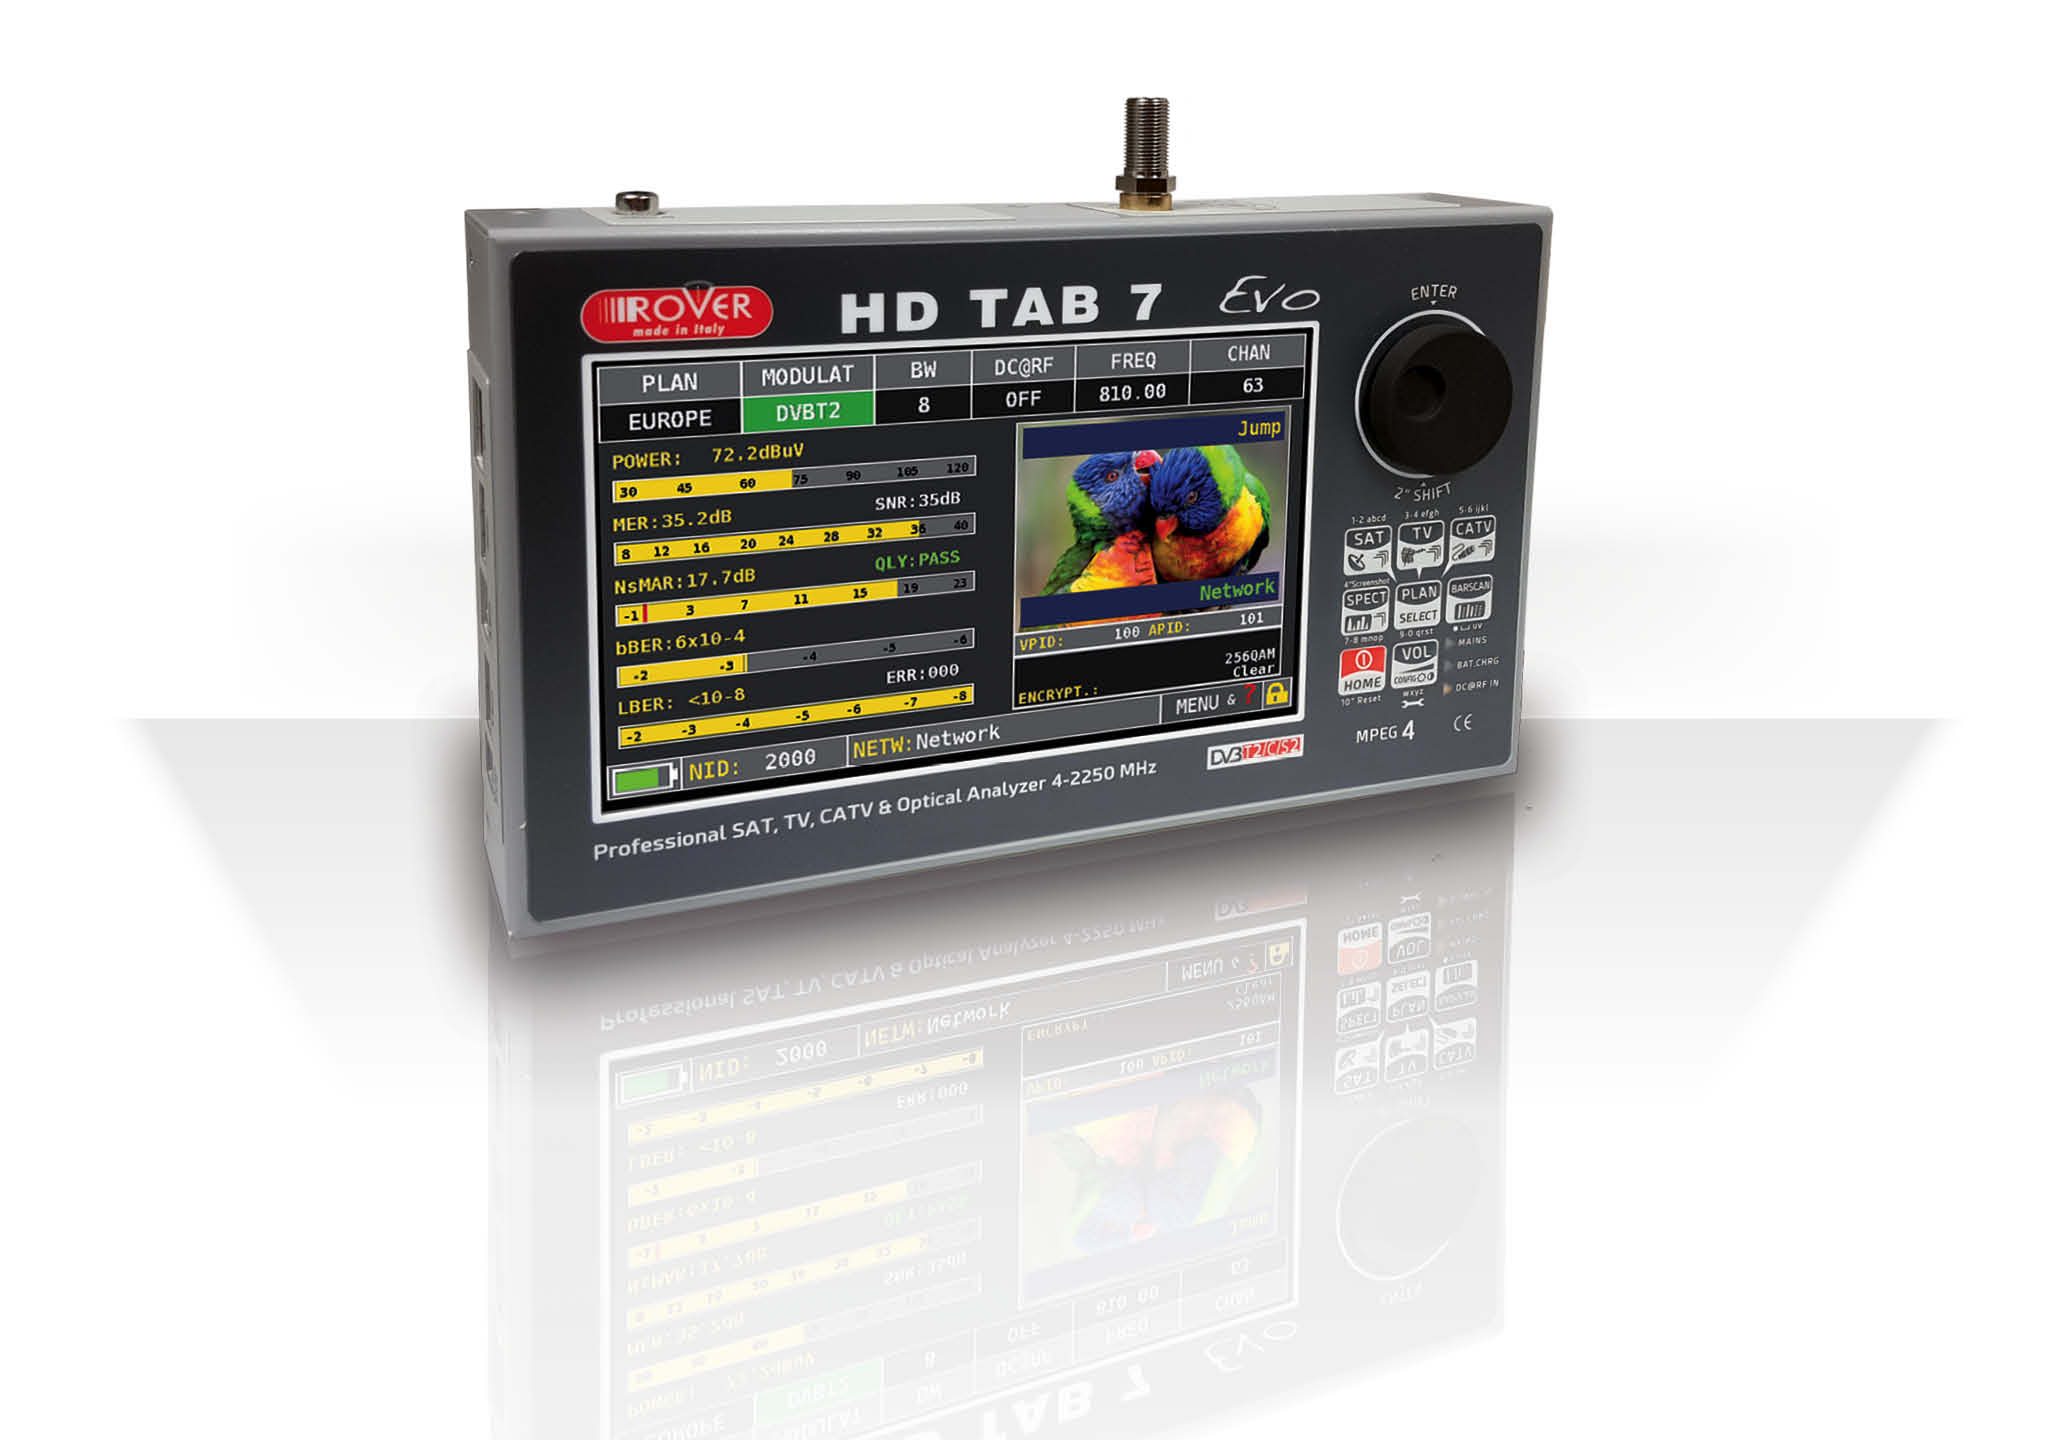 HD TAB 7 Evo - Rover Laboratories